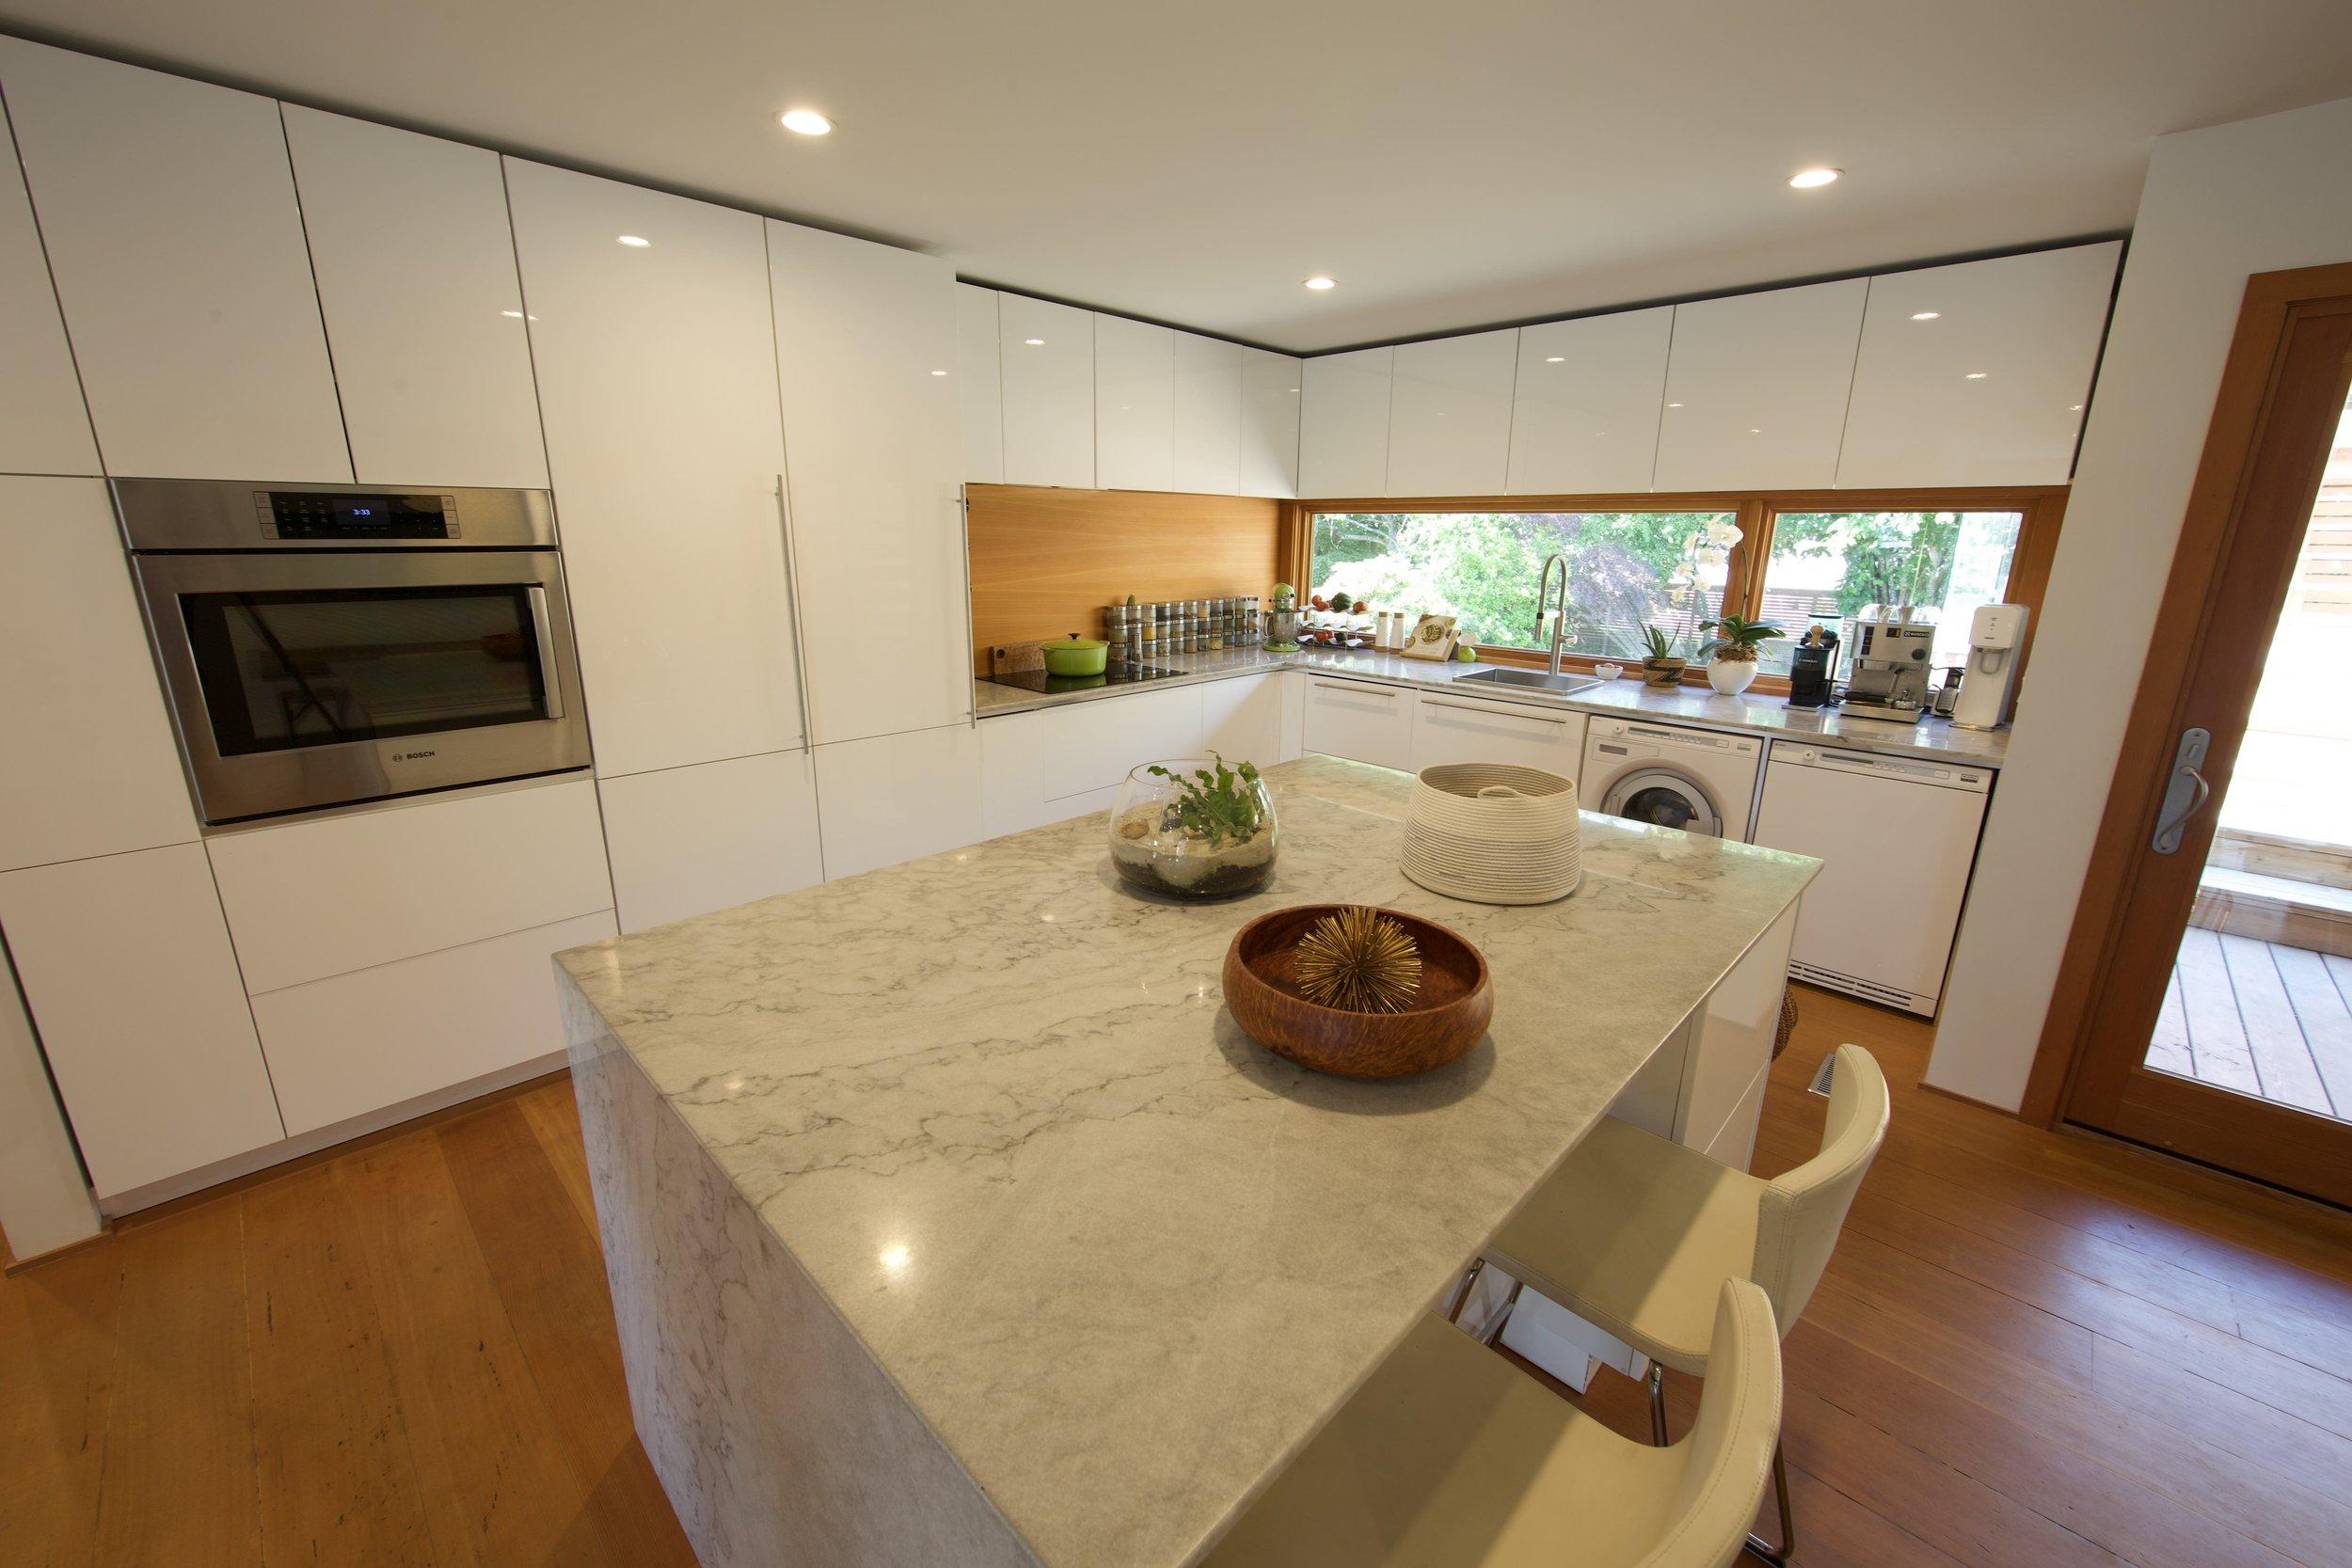 mindful home kitchen.jpg